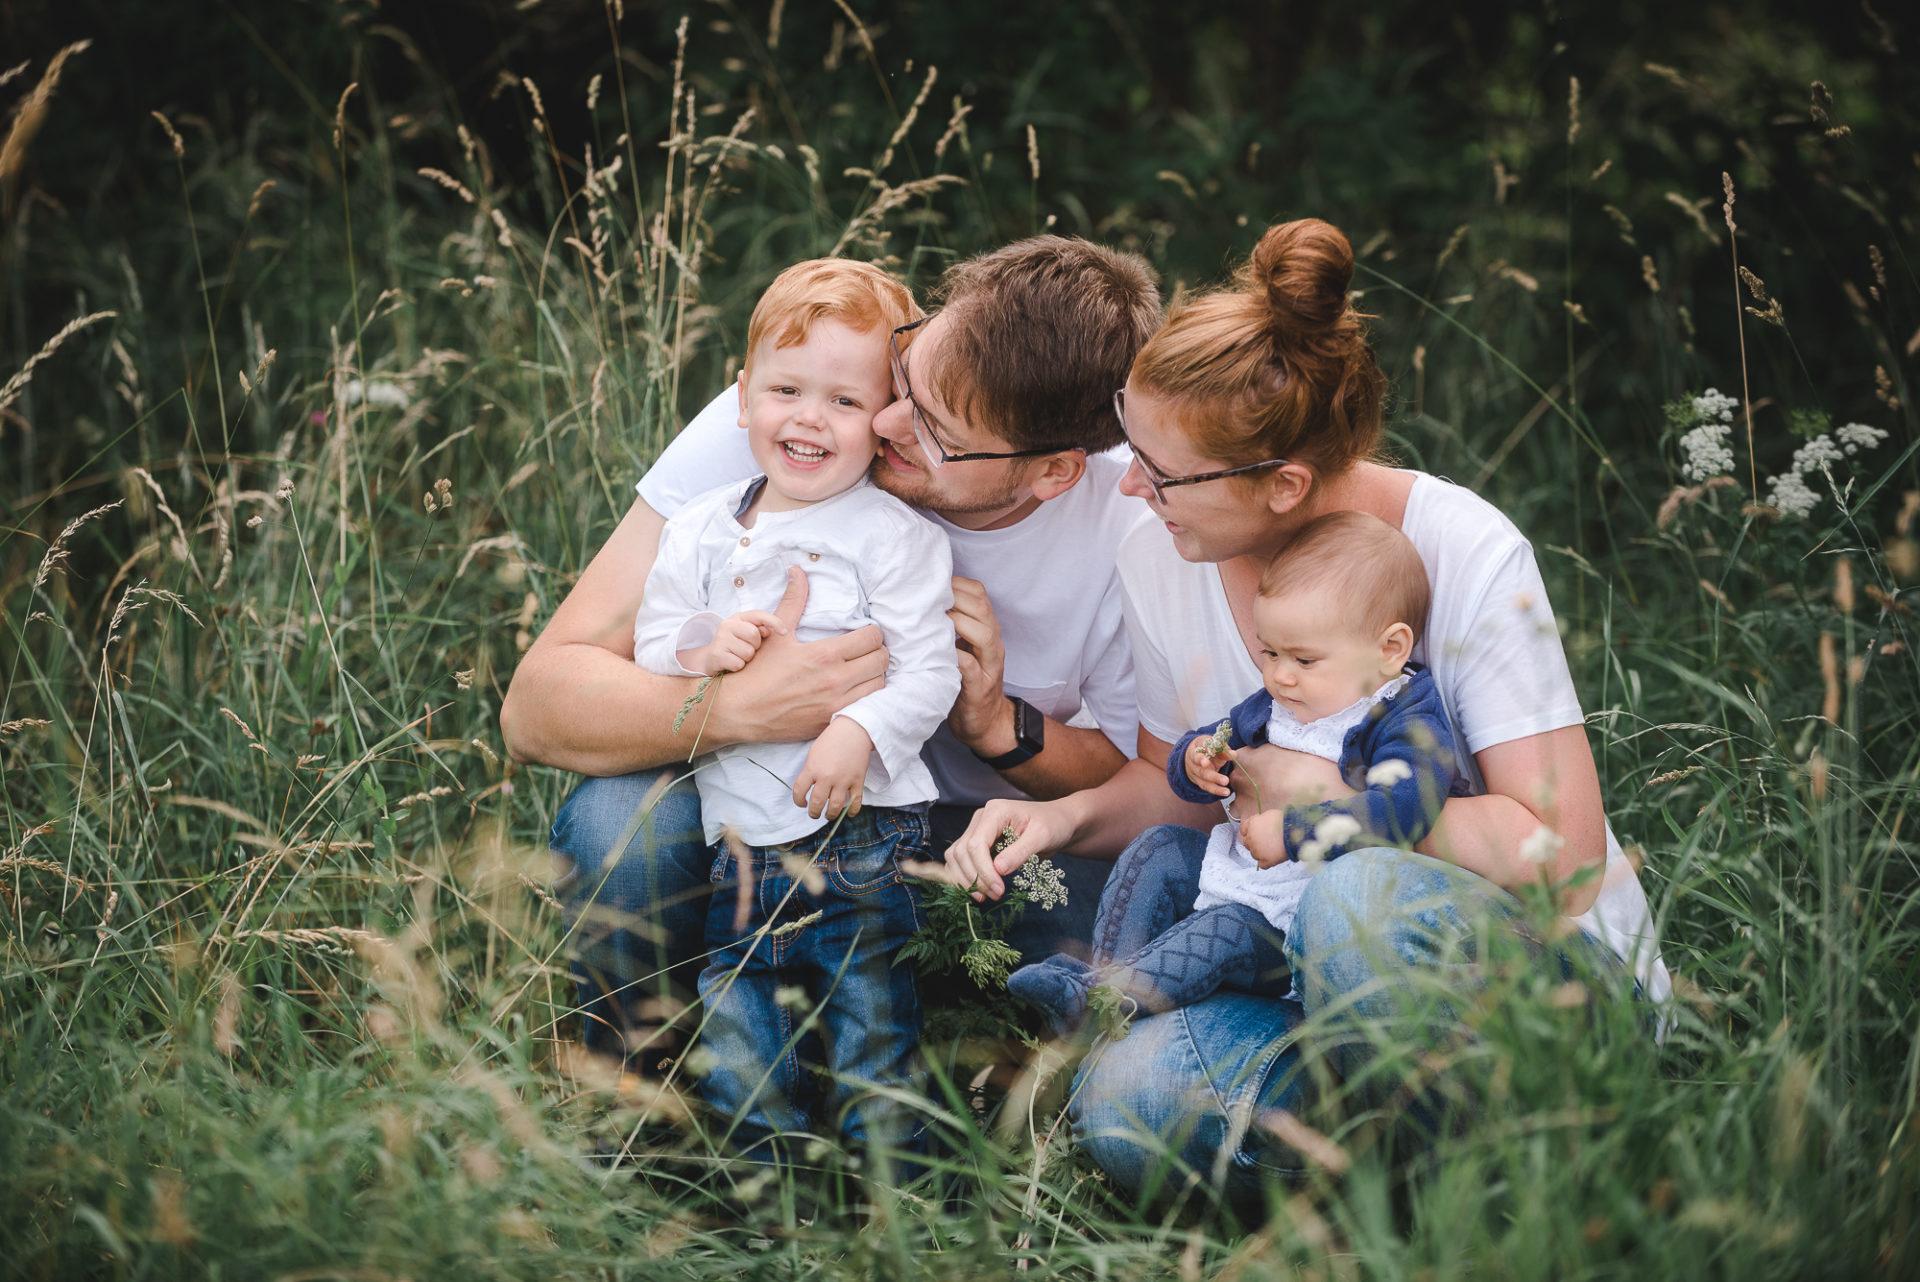 Tessa Trommer Fotografie Baby Familienshooting Babyfotografie Outdoor Familie